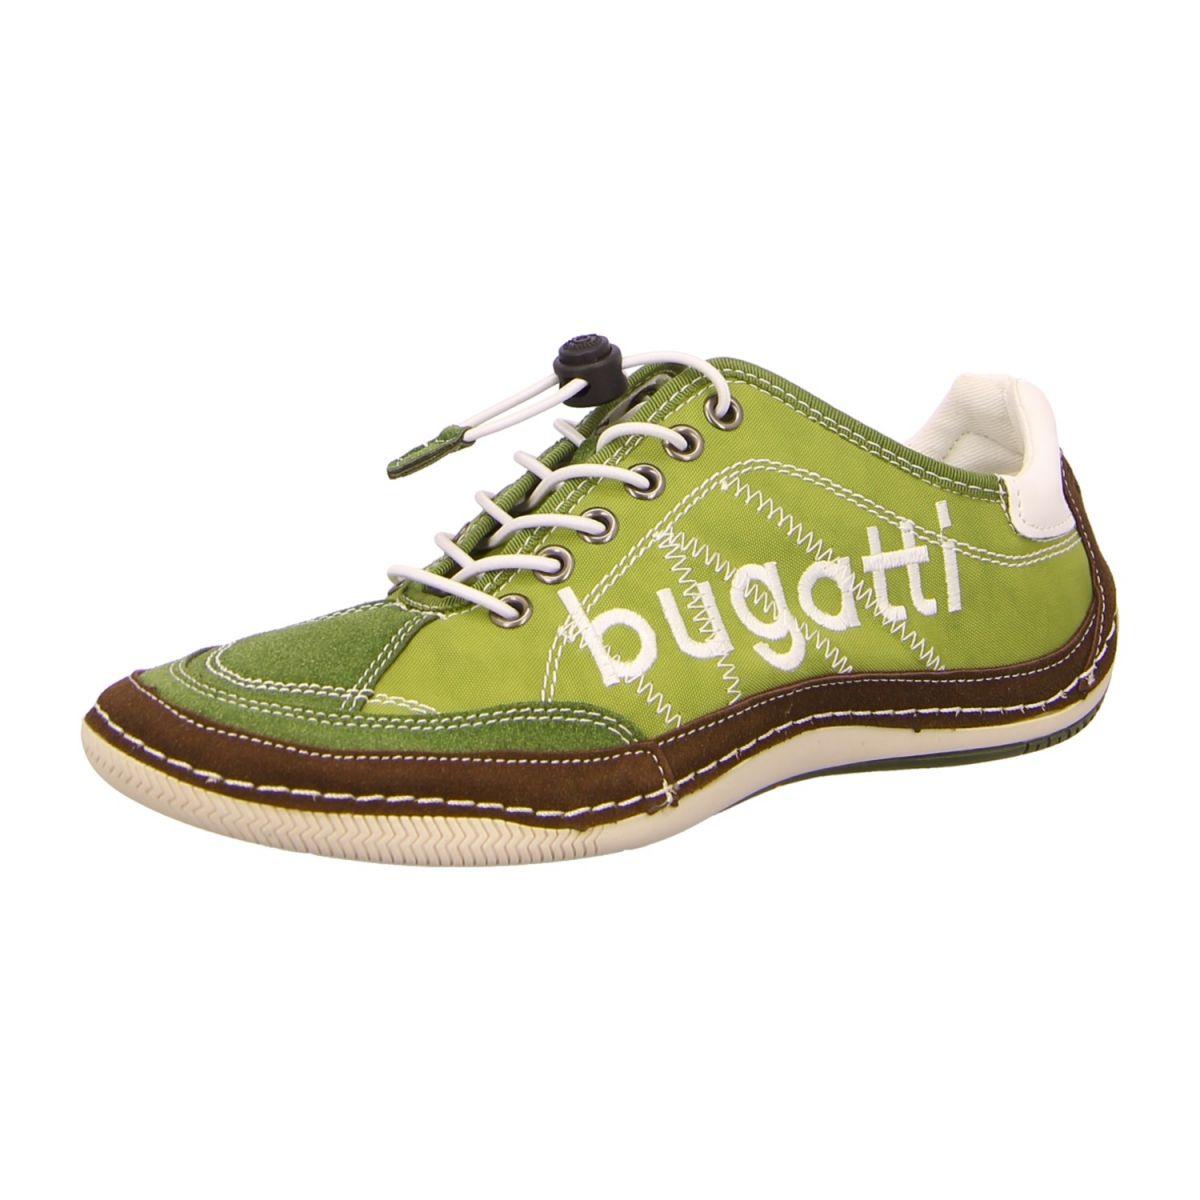 NEU: Bugatti Sneaker Canario F24606 N6 700 green